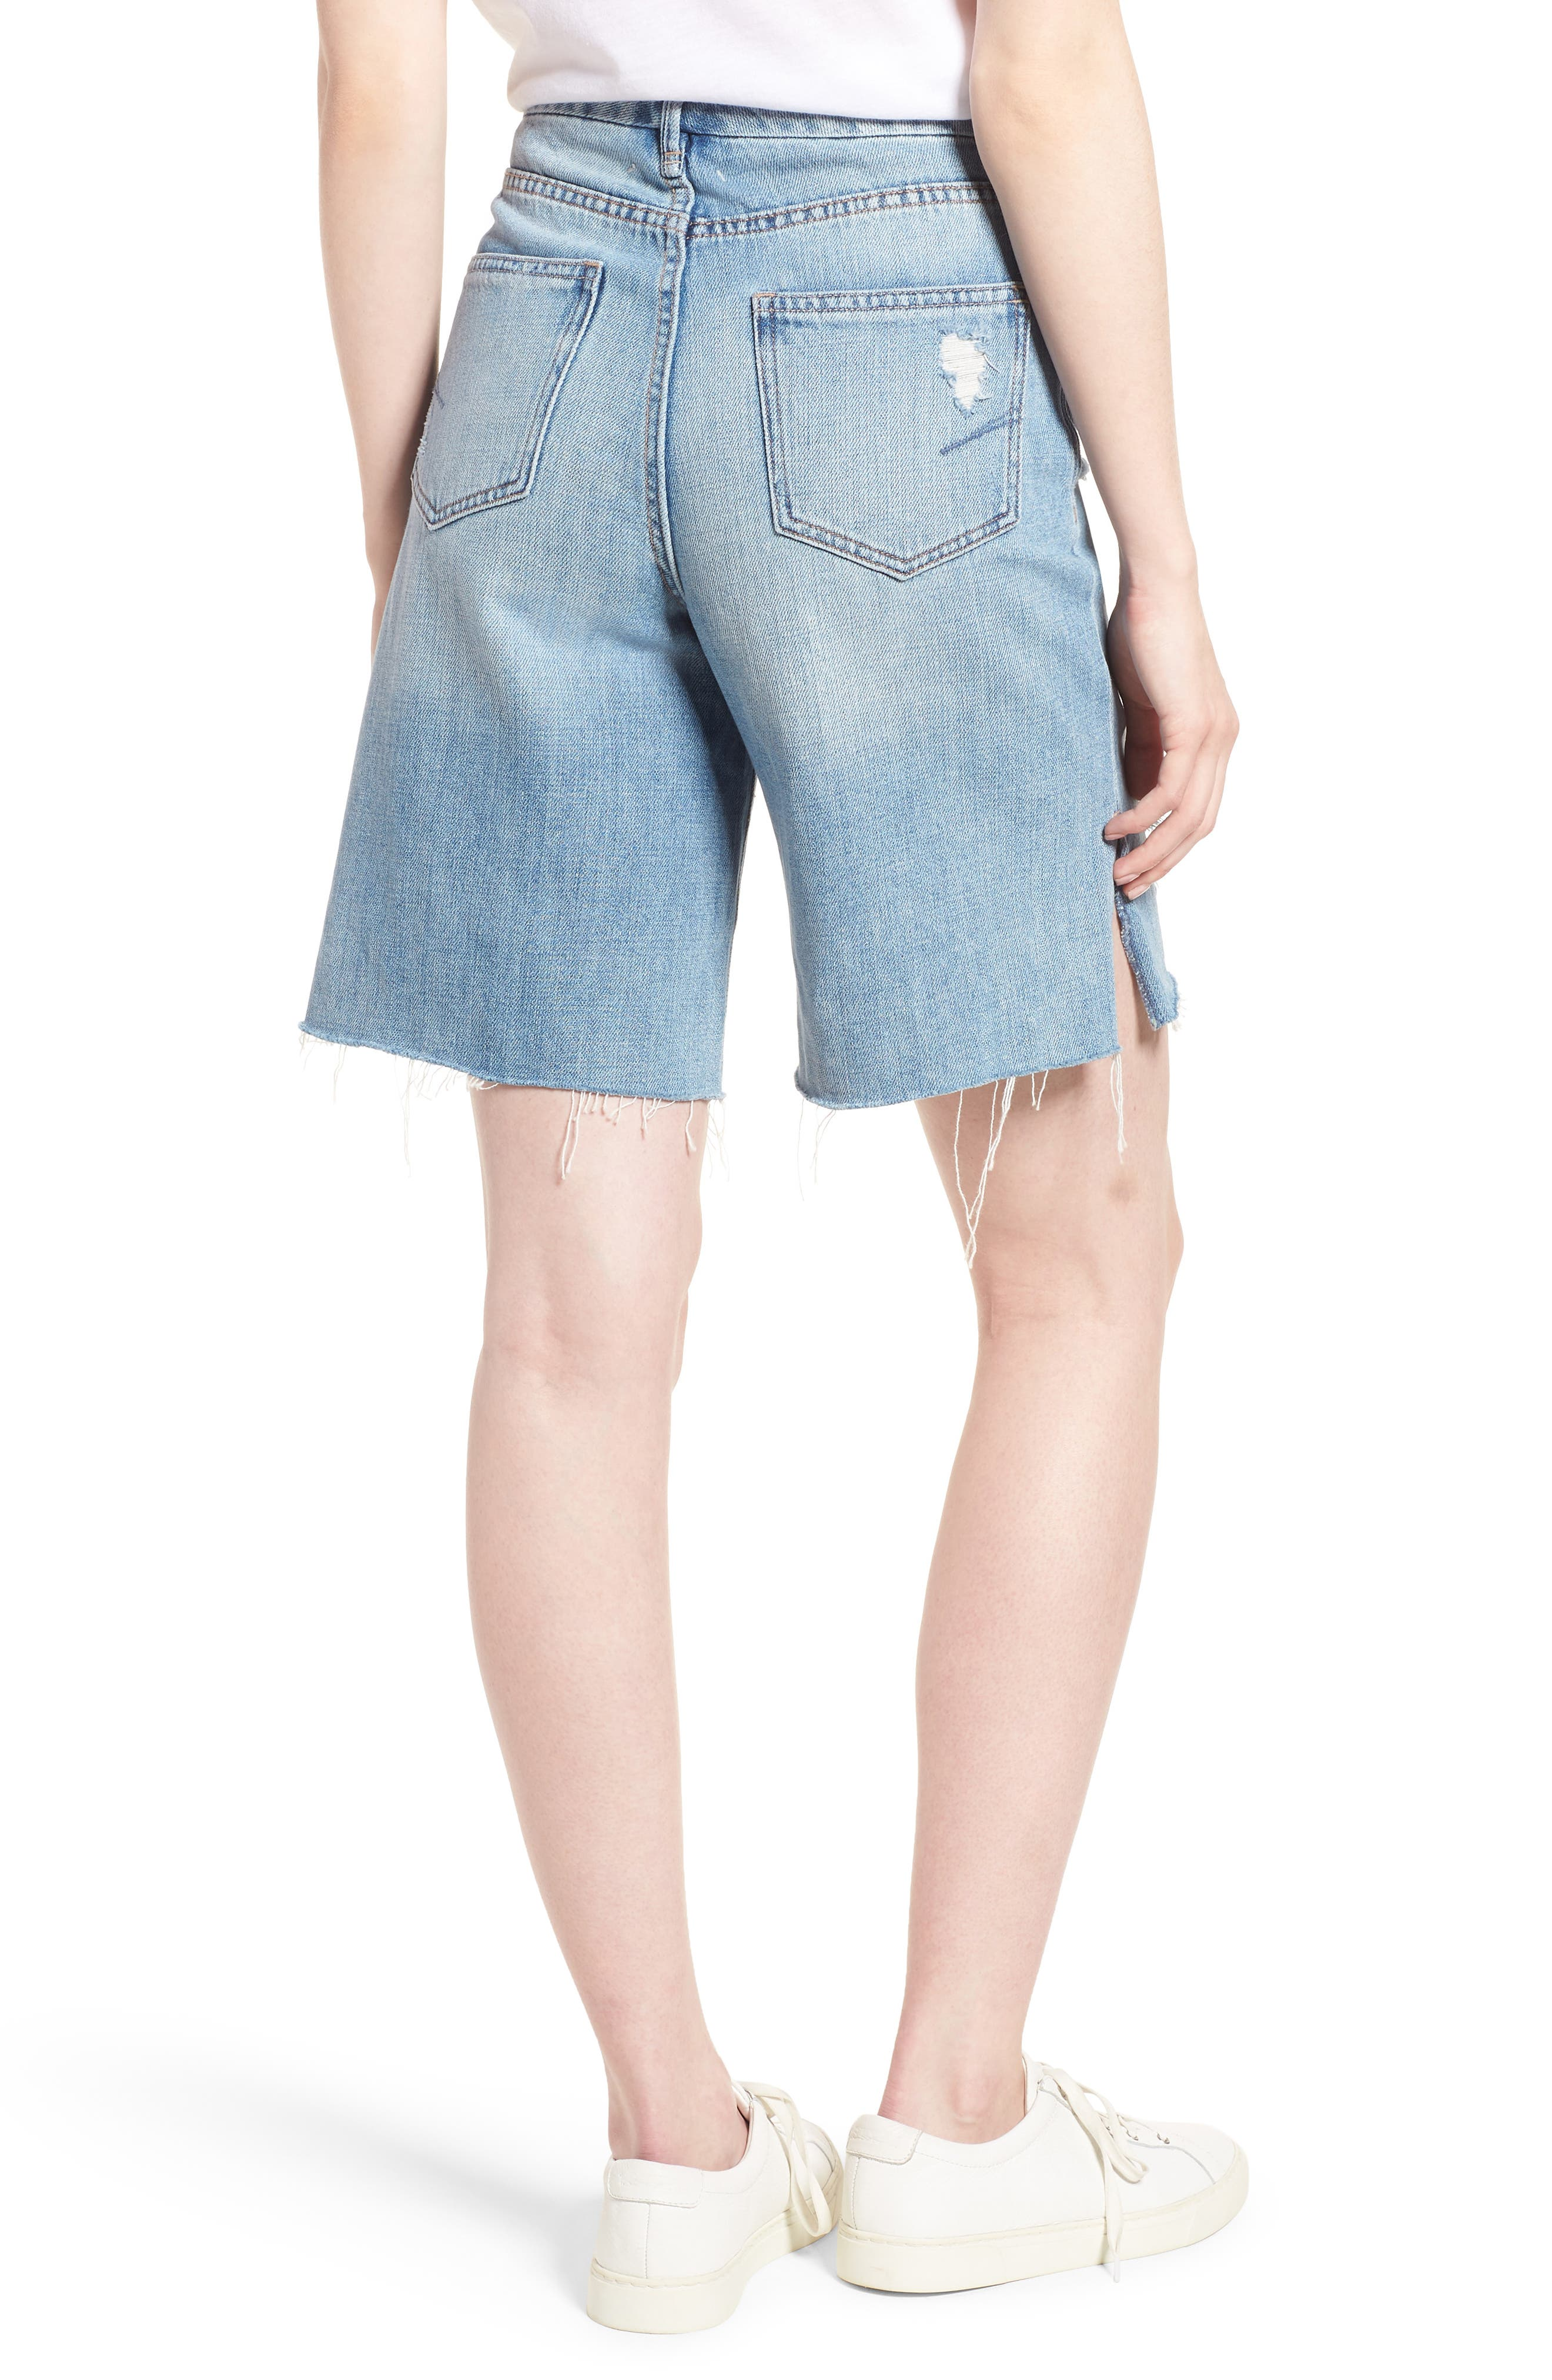 Wylie High Rise Distressed Bermuda Denim Shorts,                             Alternate thumbnail 2, color,                             Varnish